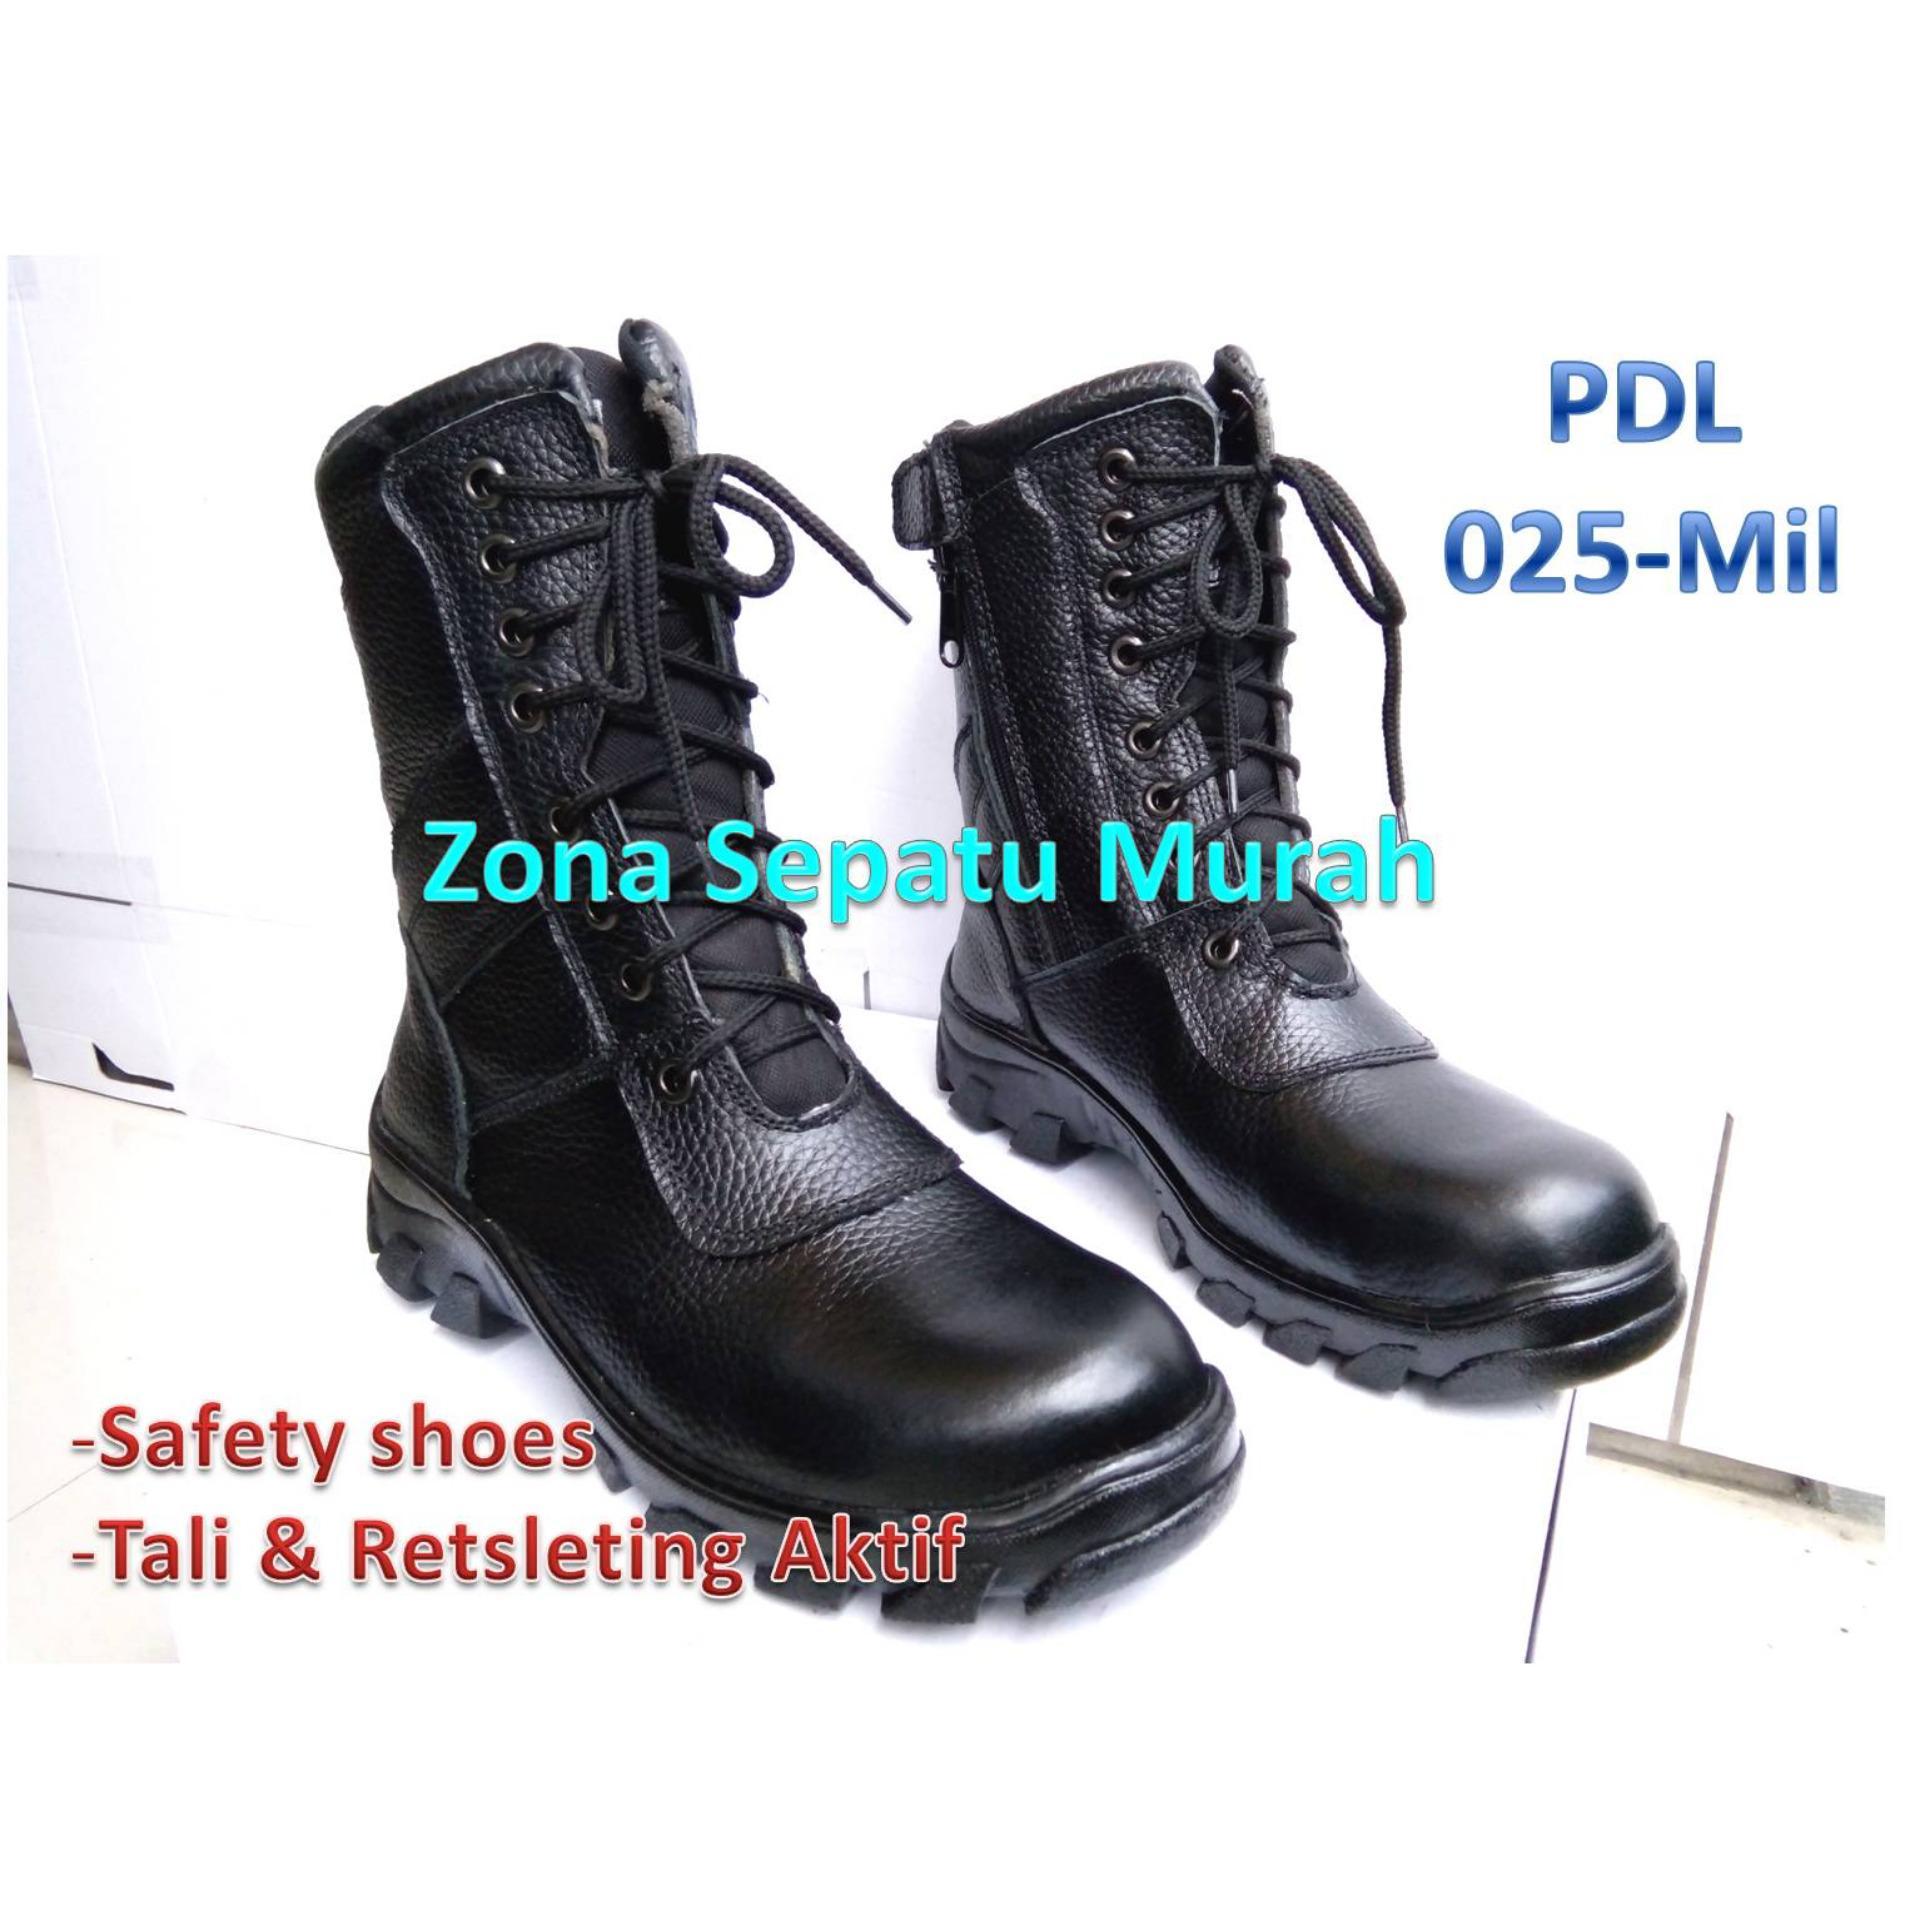 Sepatu Pdl Seri Kobra Mil Standar Tni Polri Security Dll Bestquality Ter Safety Model 025 Motif Kulit Jeruk Safetytni